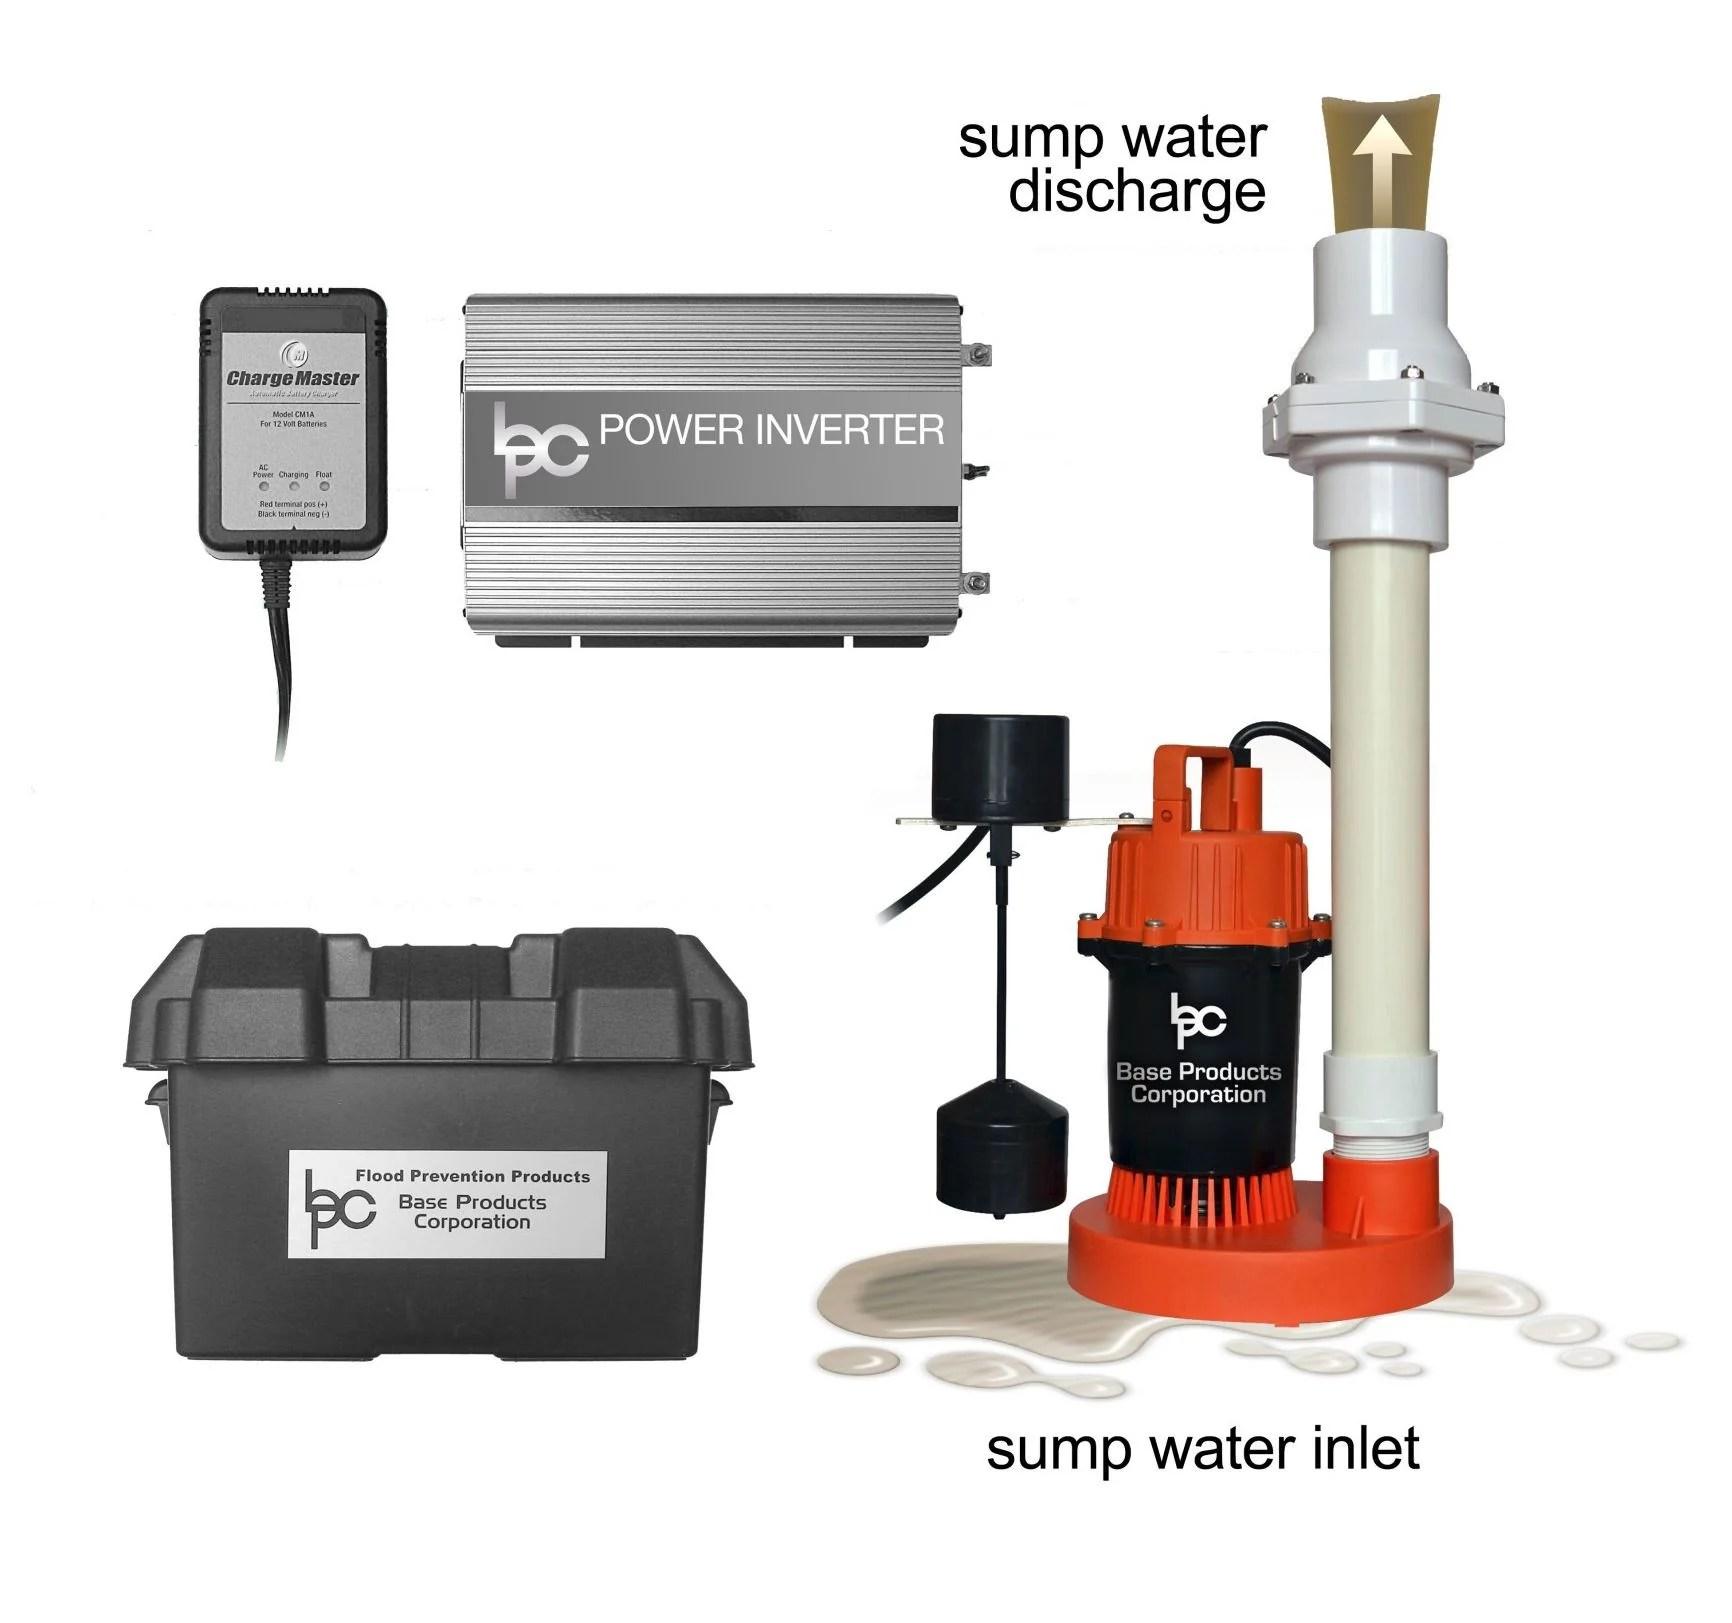 battery powered backup sump pump product image hydropump ph3000 [ 1732 x 1623 Pixel ]